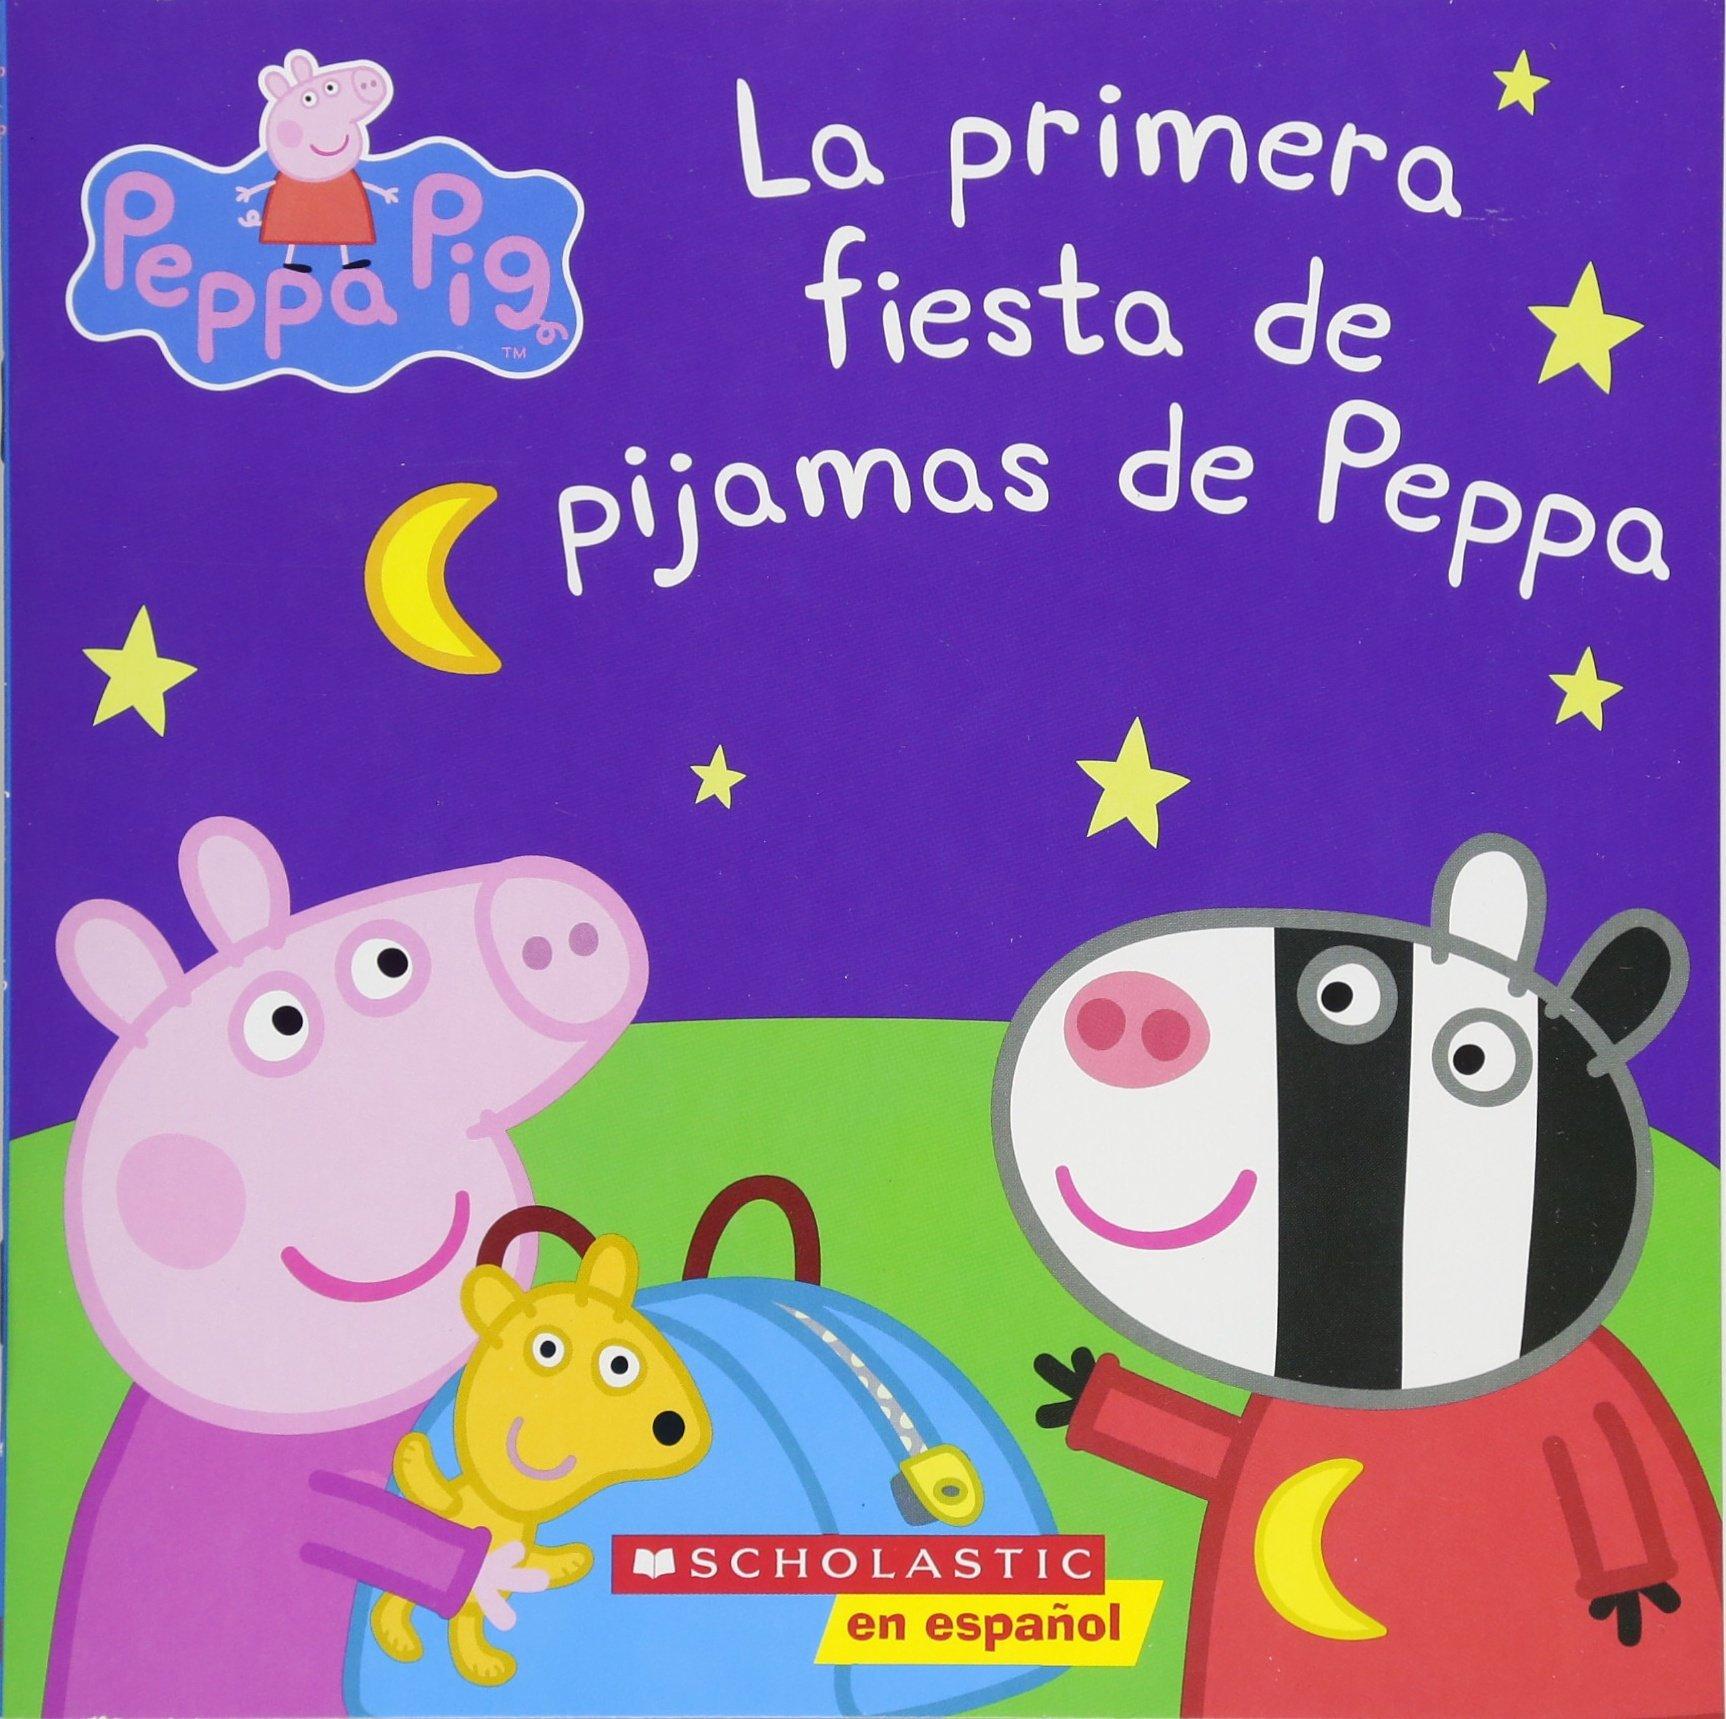 La Peppa Pig  La Primera Fiesta De Pijamas De Peppa  Peppa's First Sleepover  = Peppa's First Sleepover